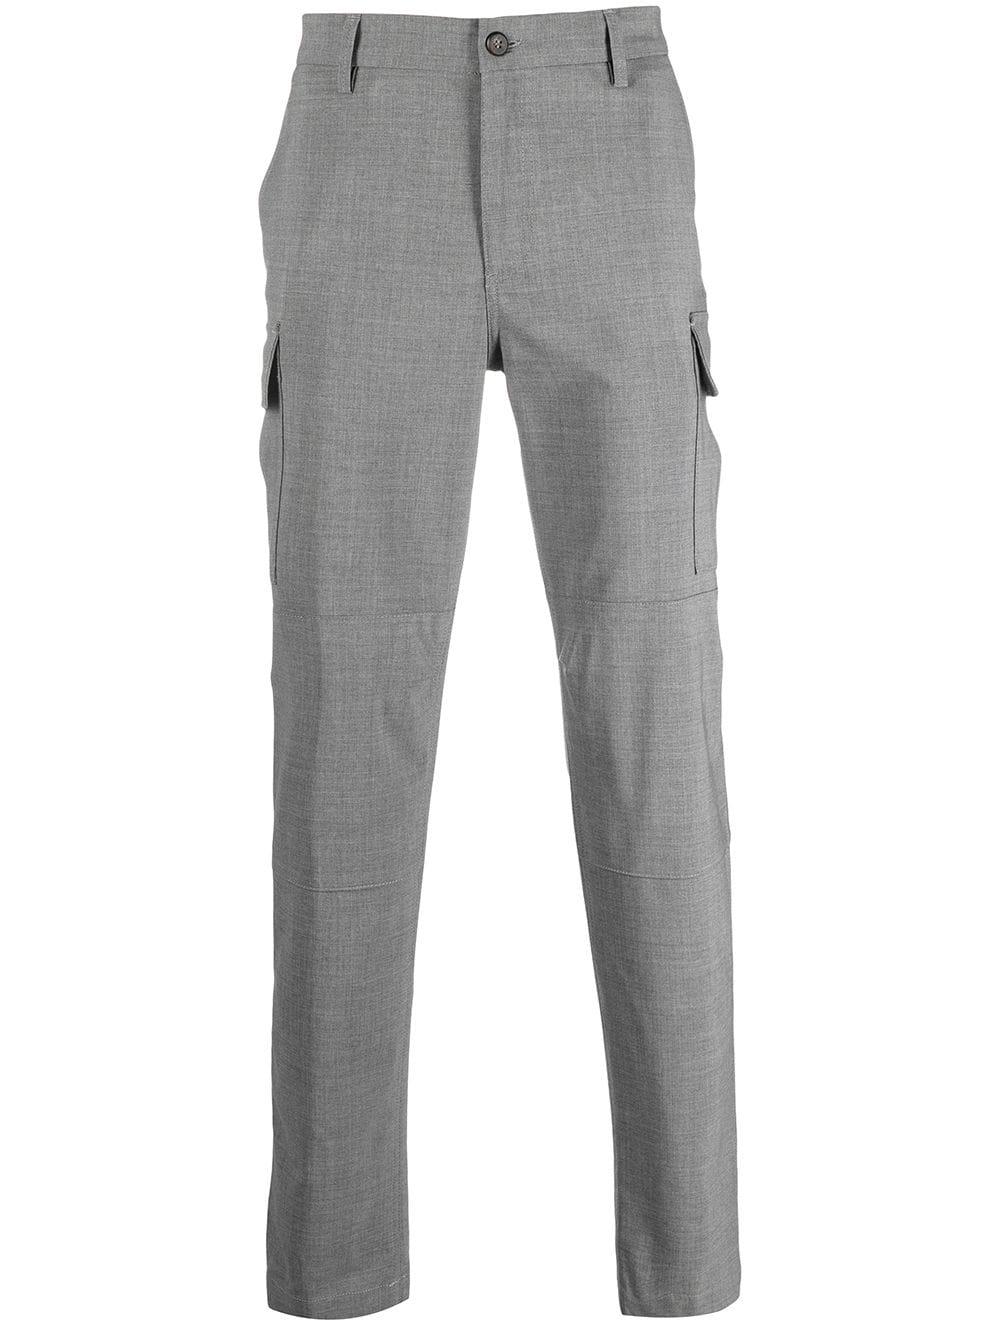 Pantaloni multitasche in lana grigia ELEVENTY | Pantaloni | C75PANA15-TES0A05313